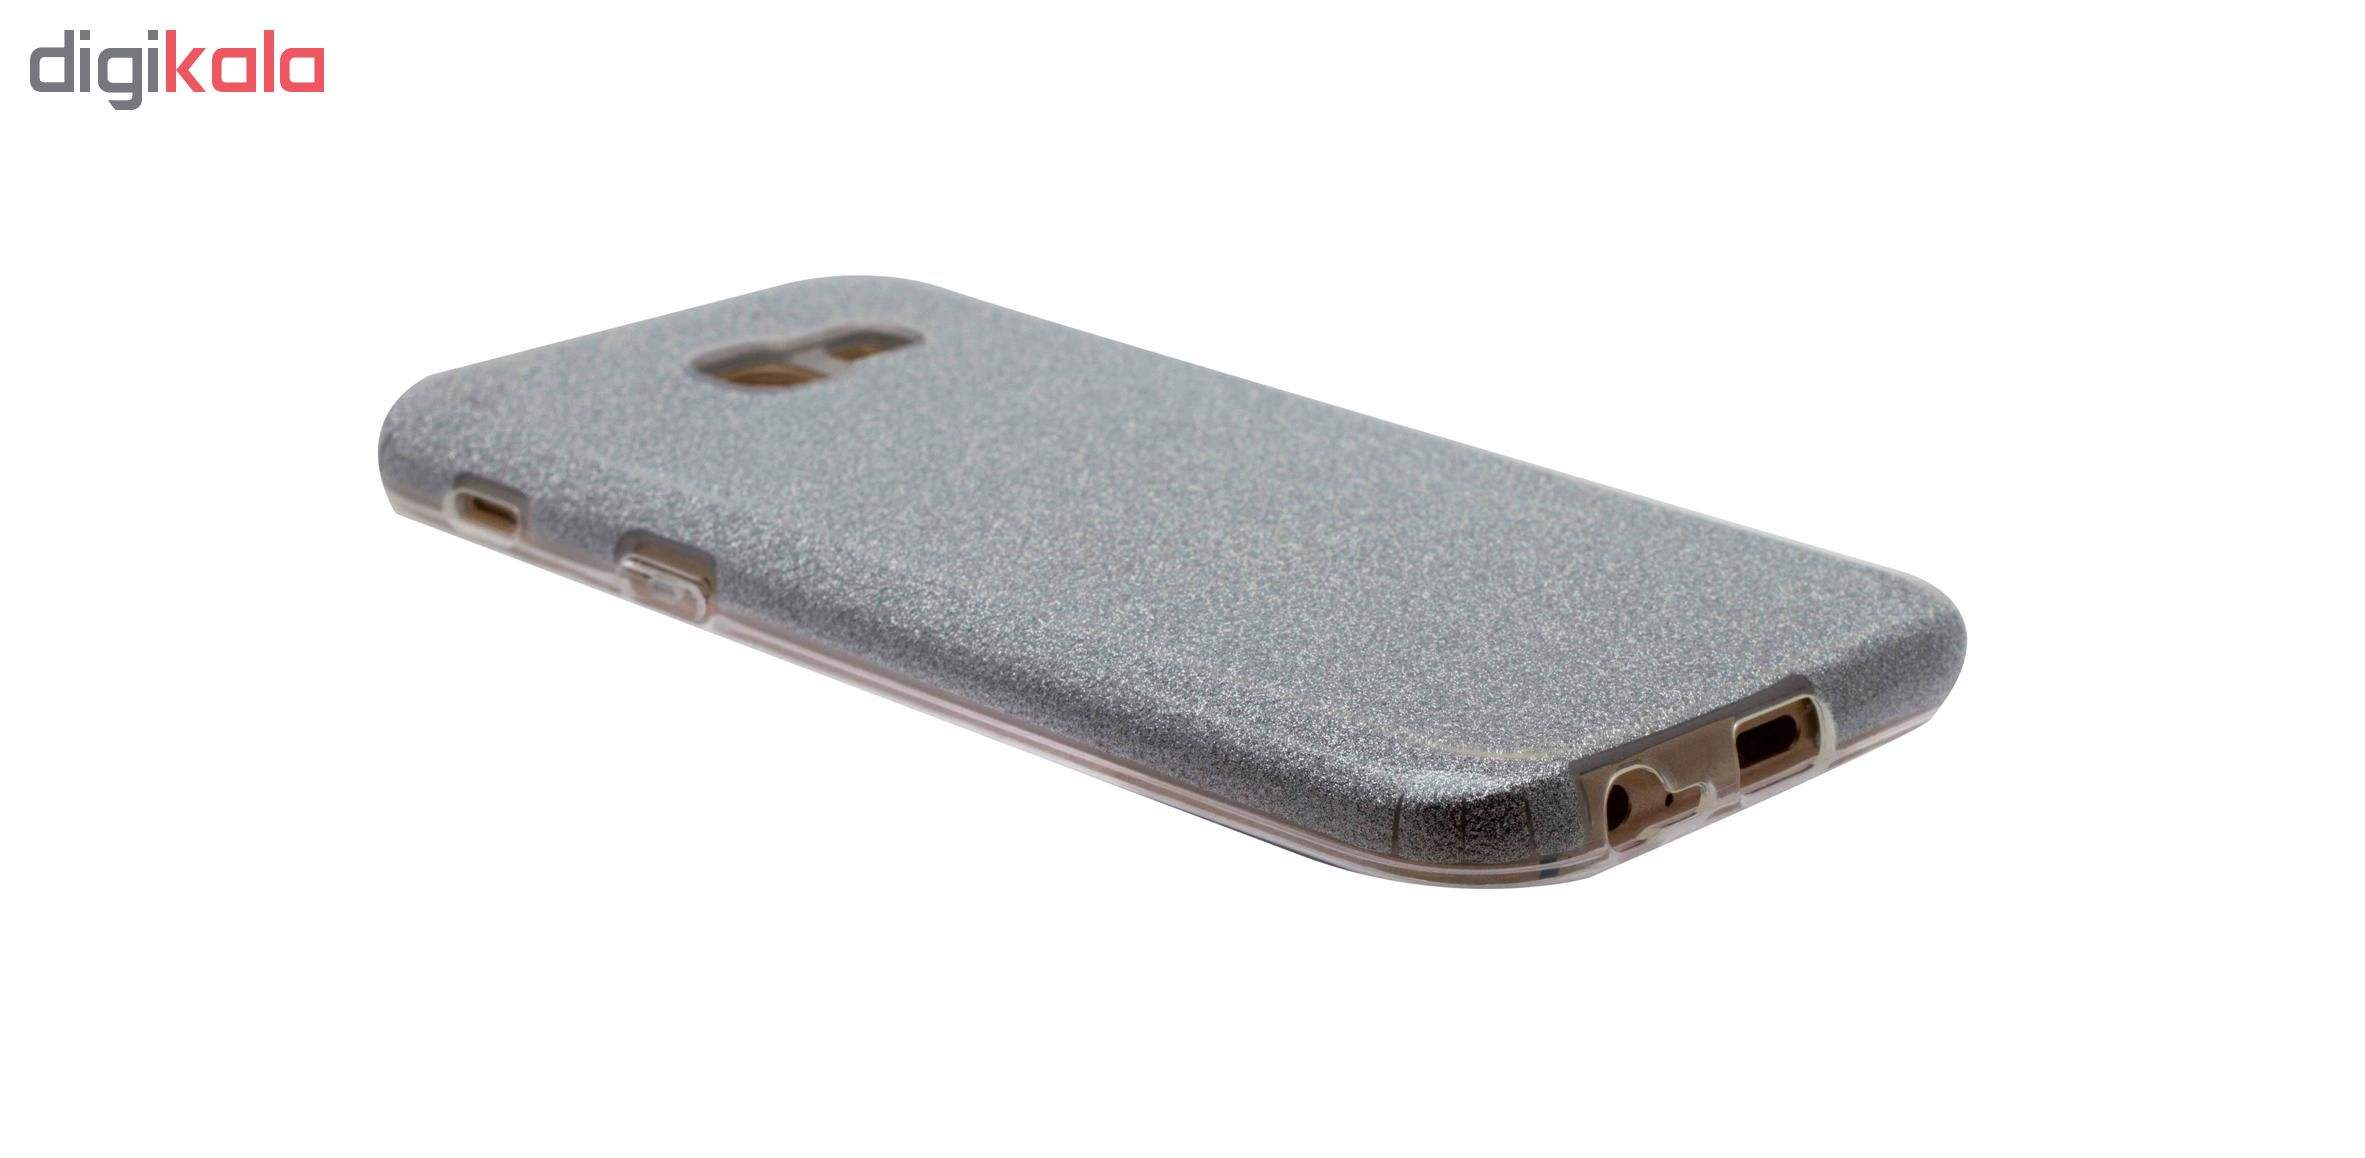 کاور مدل CORONA طرح اکلیلی مناسب برای گوشی سامسونگ گلکسی A5 2017 / A520 main 1 7